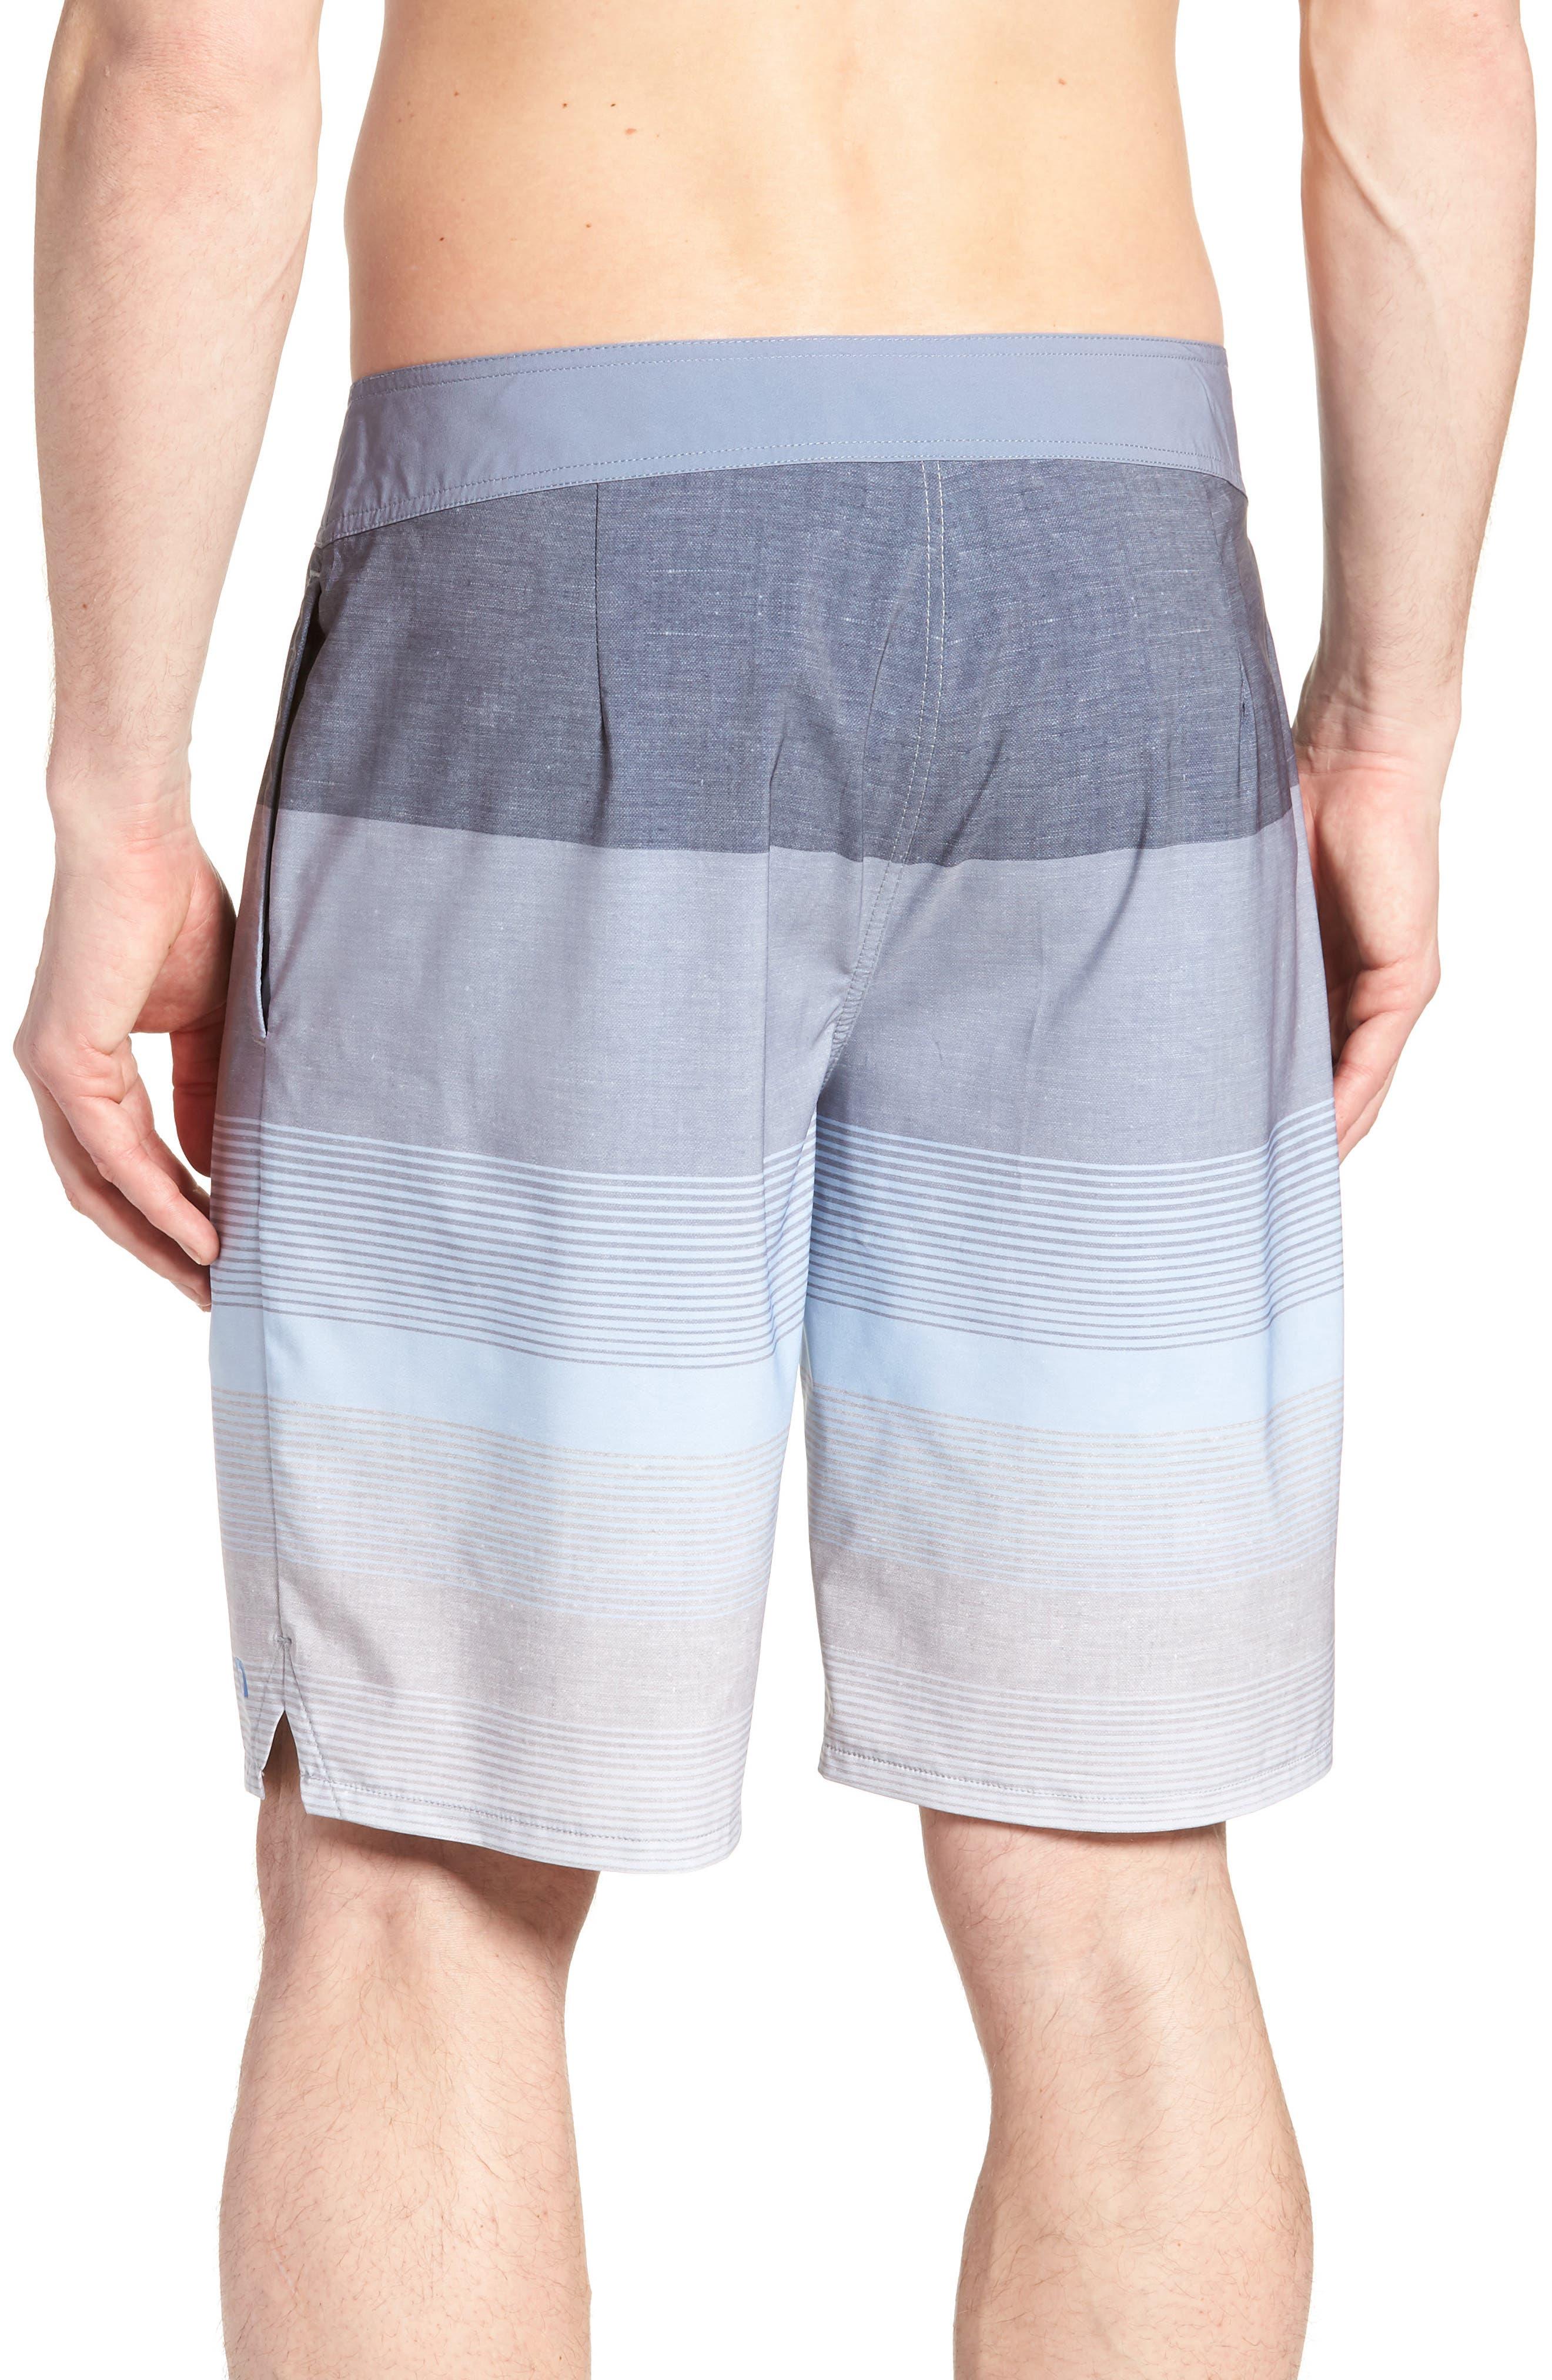 Seegrid Regular Fit Board Shorts,                             Alternate thumbnail 2, color,                             401